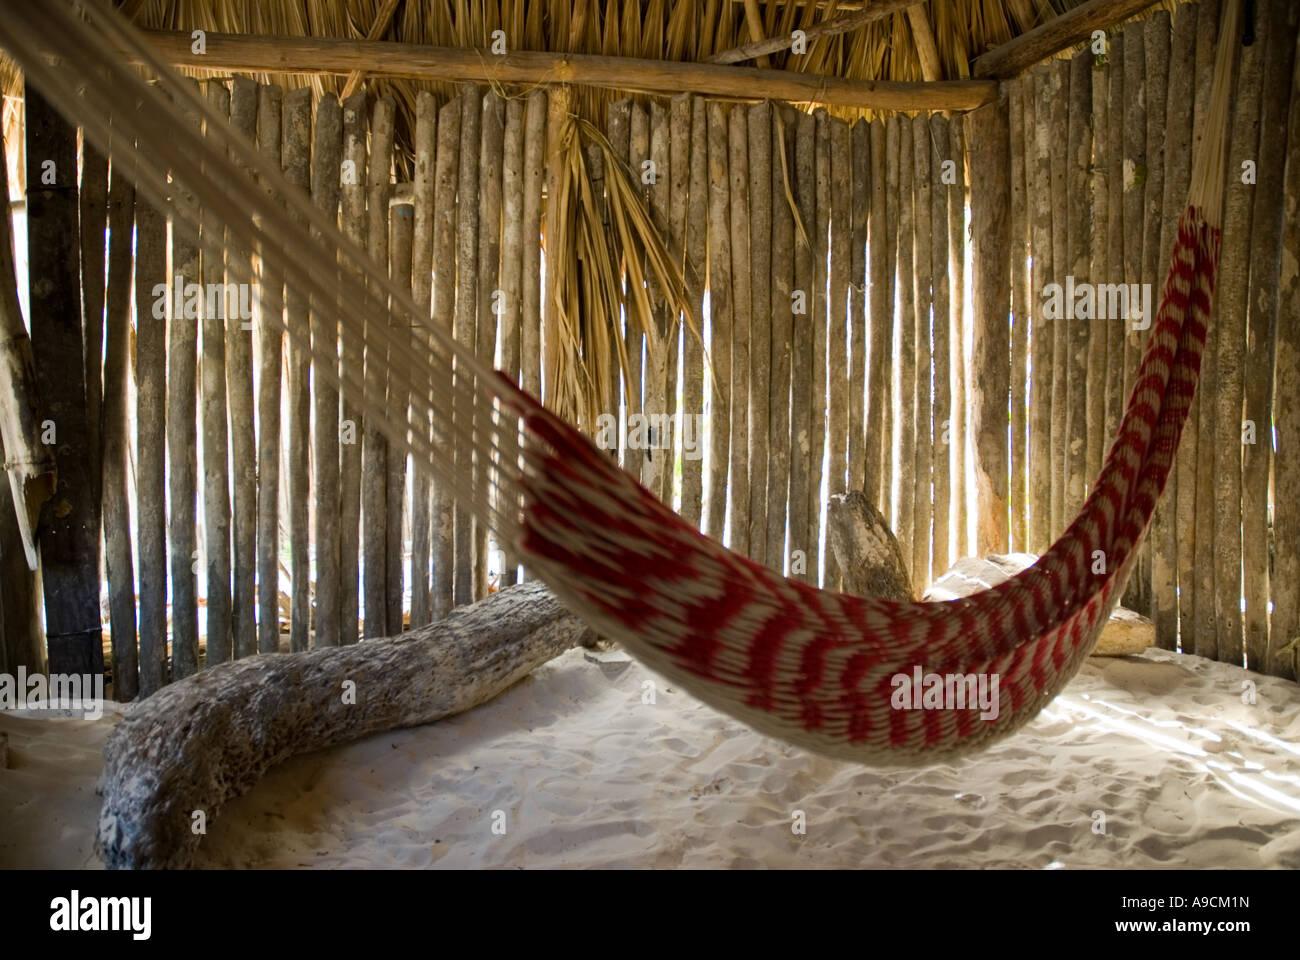 tulum caribbean cabana hut and hammock tulum caribbean cabana hut and hammock stock photo royalty free      rh   alamy